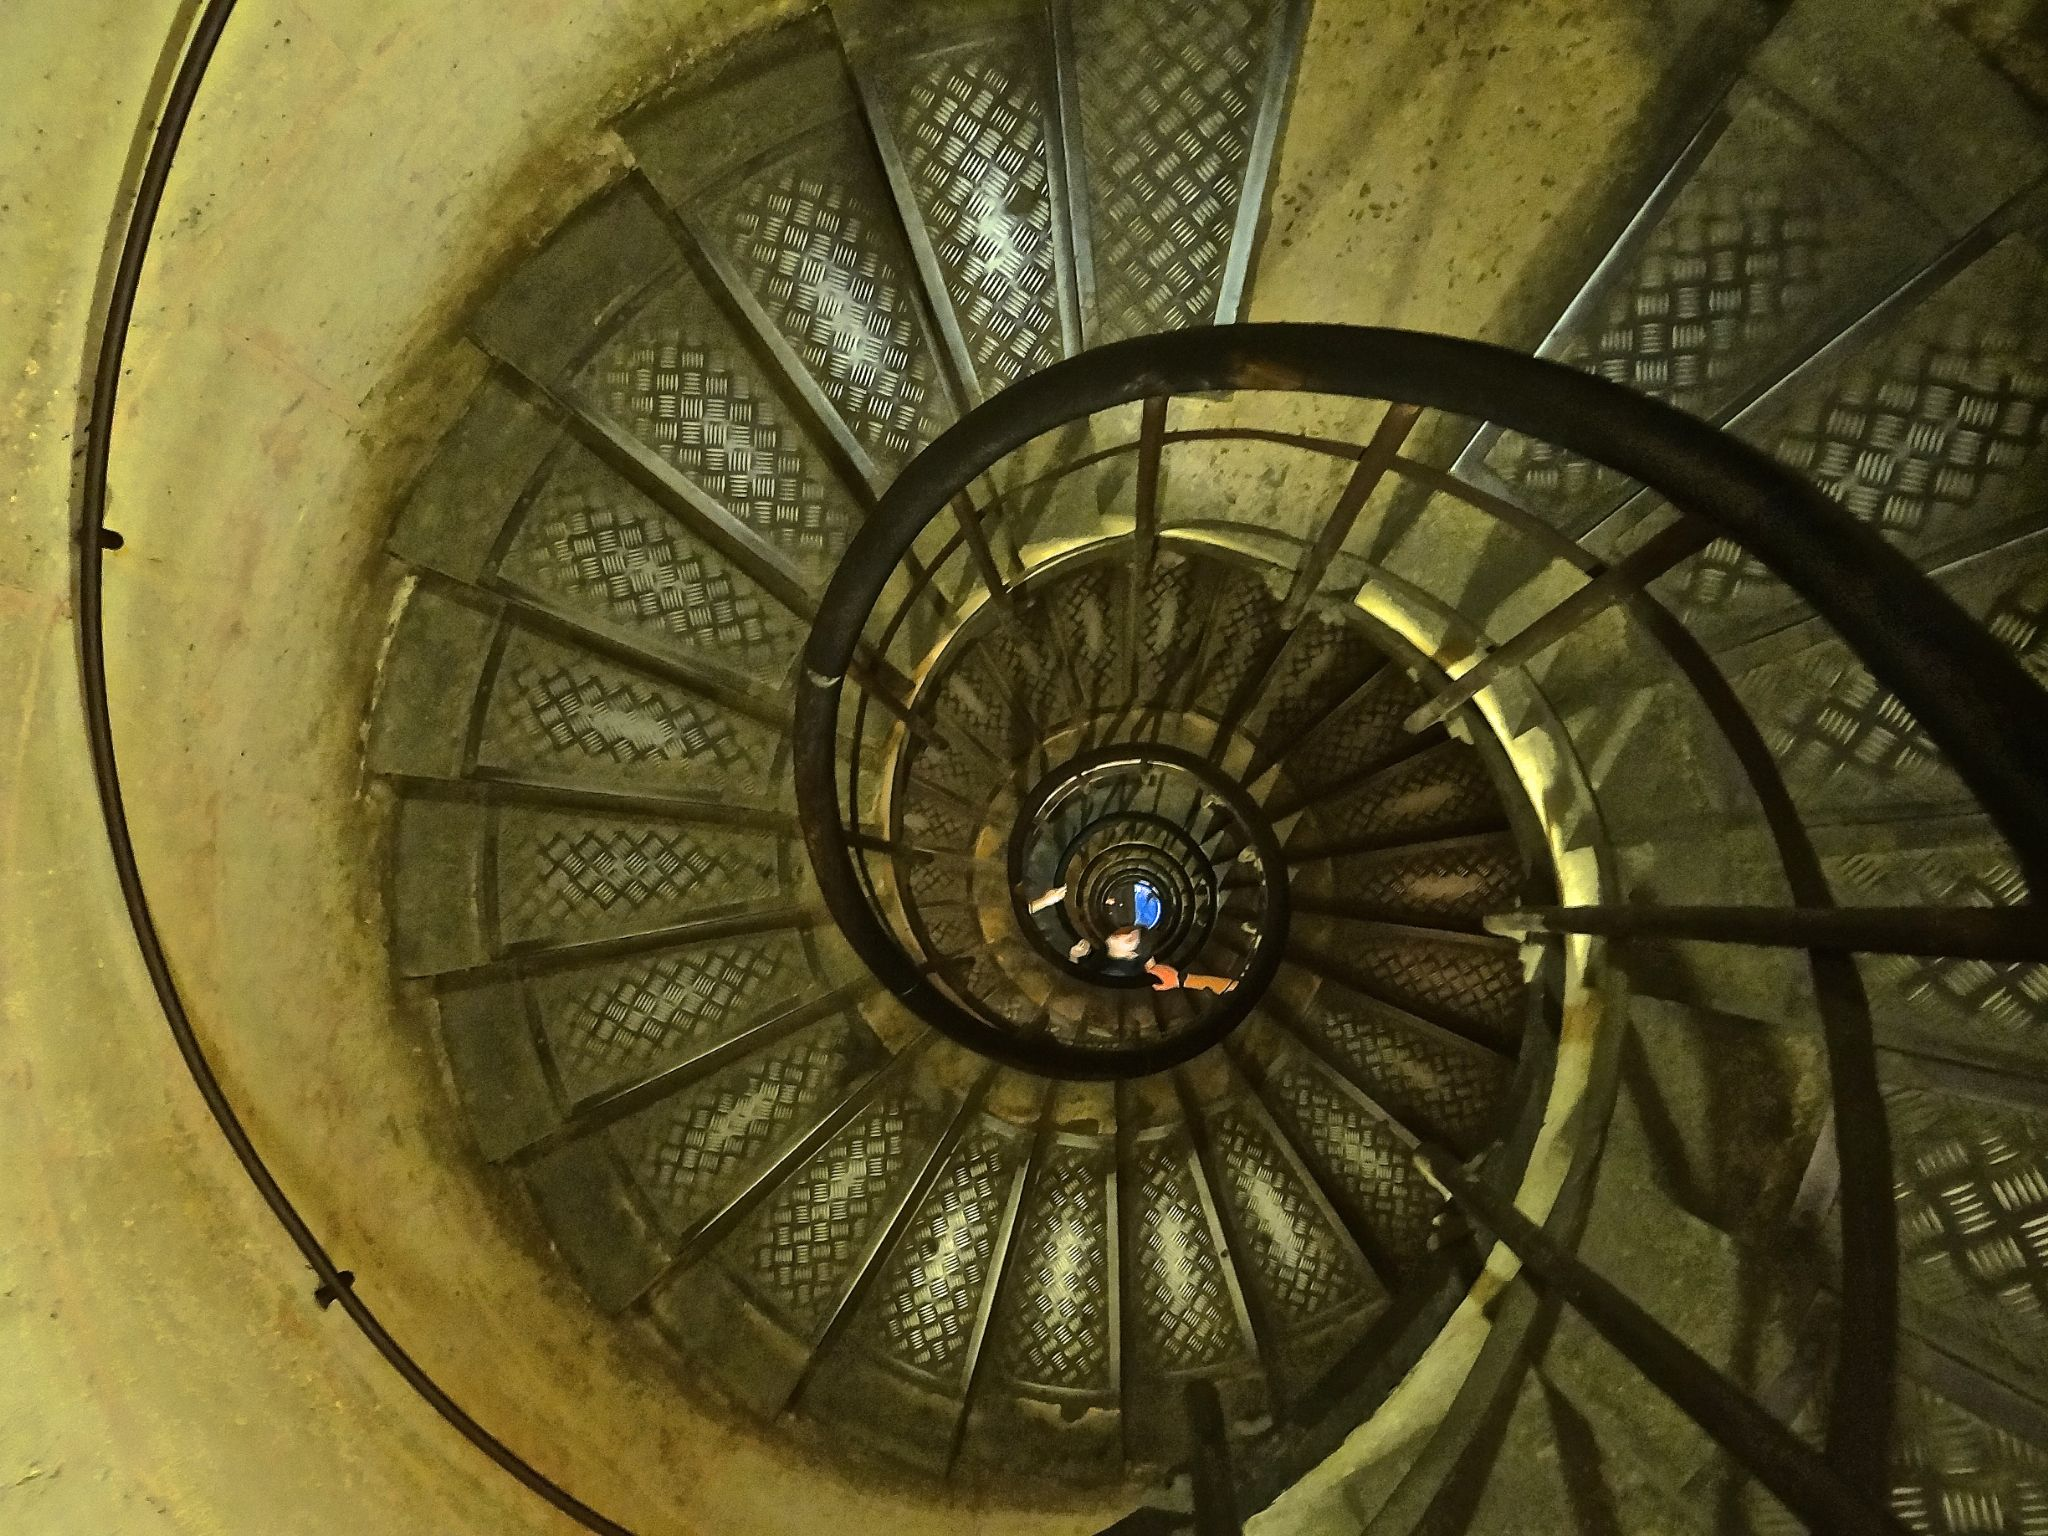 Spiraql Staircase - Arch De Triumph by Steve Aicinena